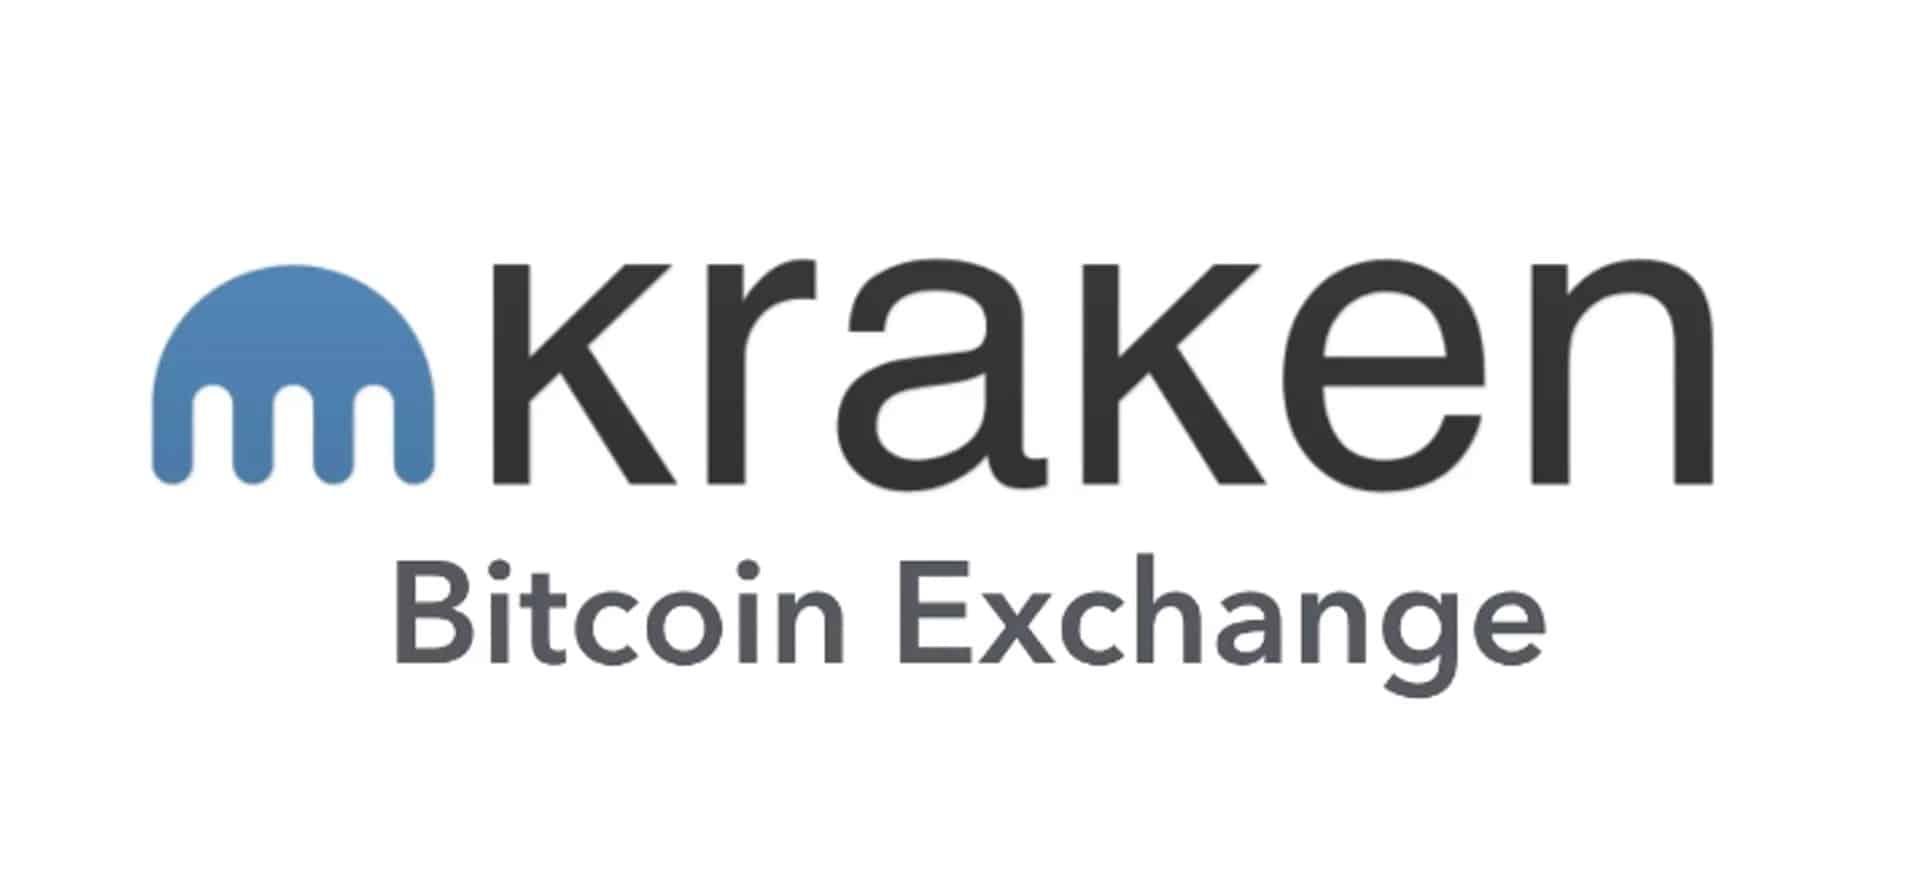 Échange de bitcoins